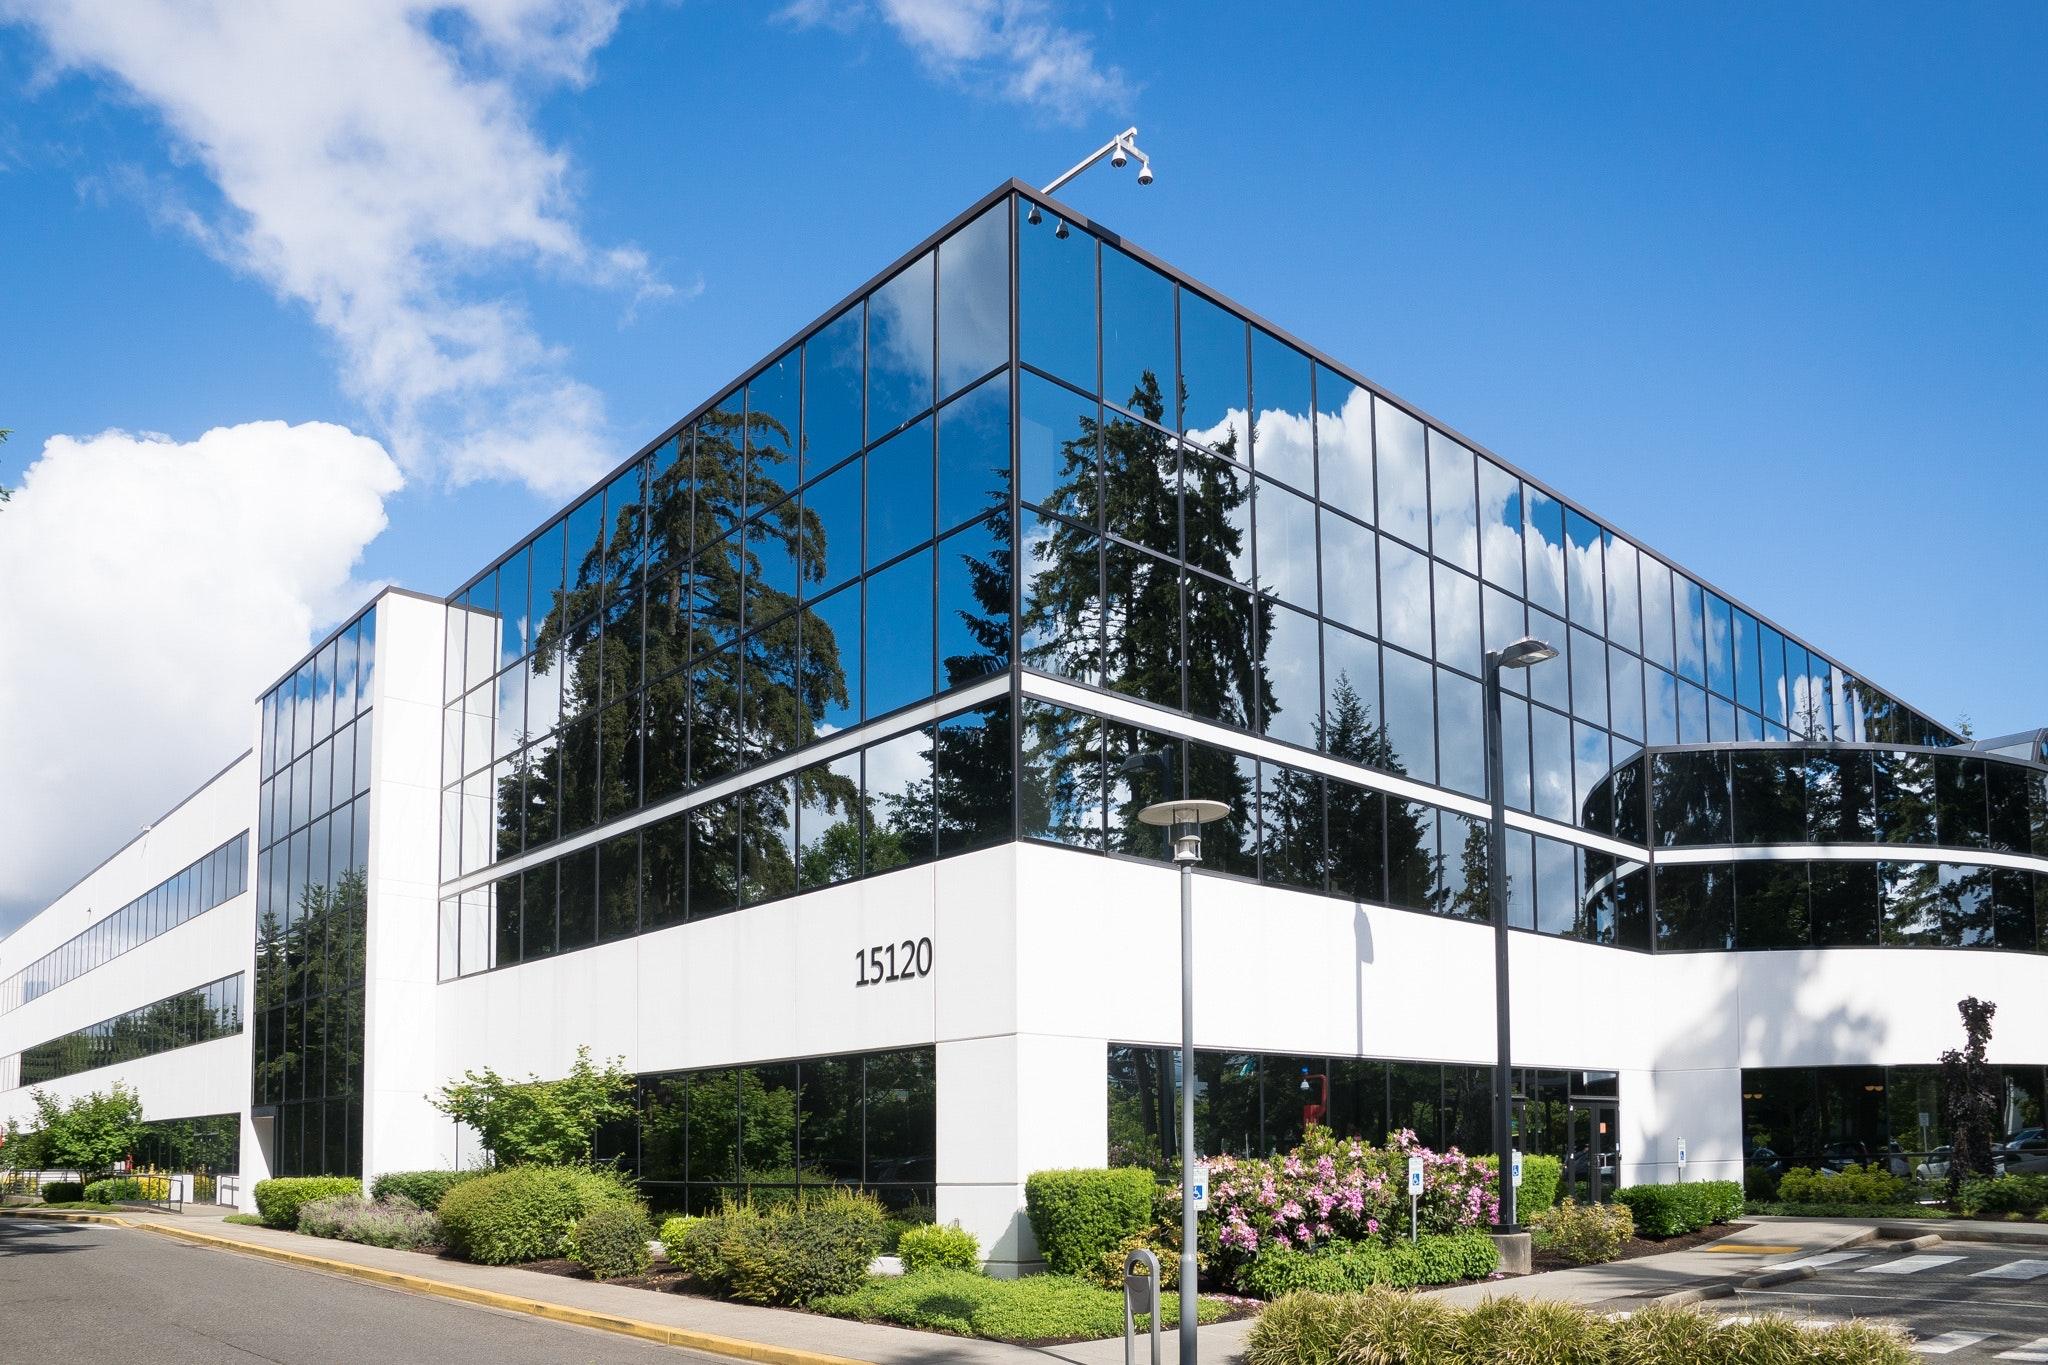 Commercial Loan Eastern Savings Bank